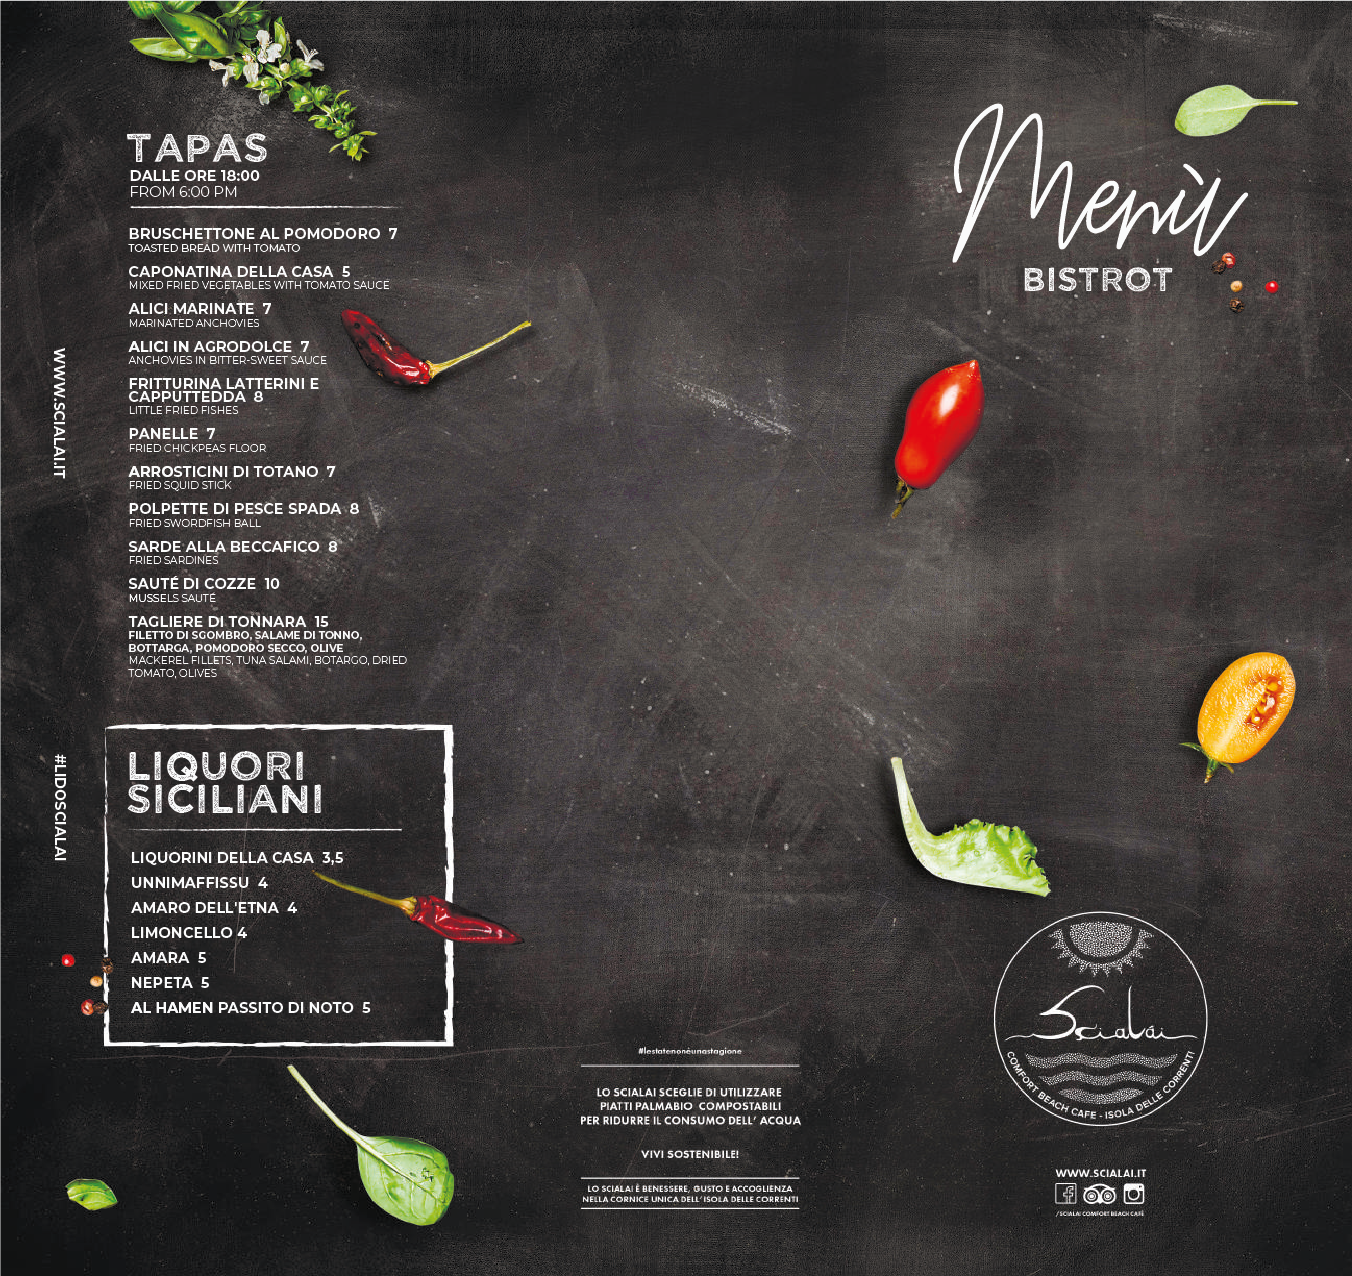 menu-bistrot-scialai-2021